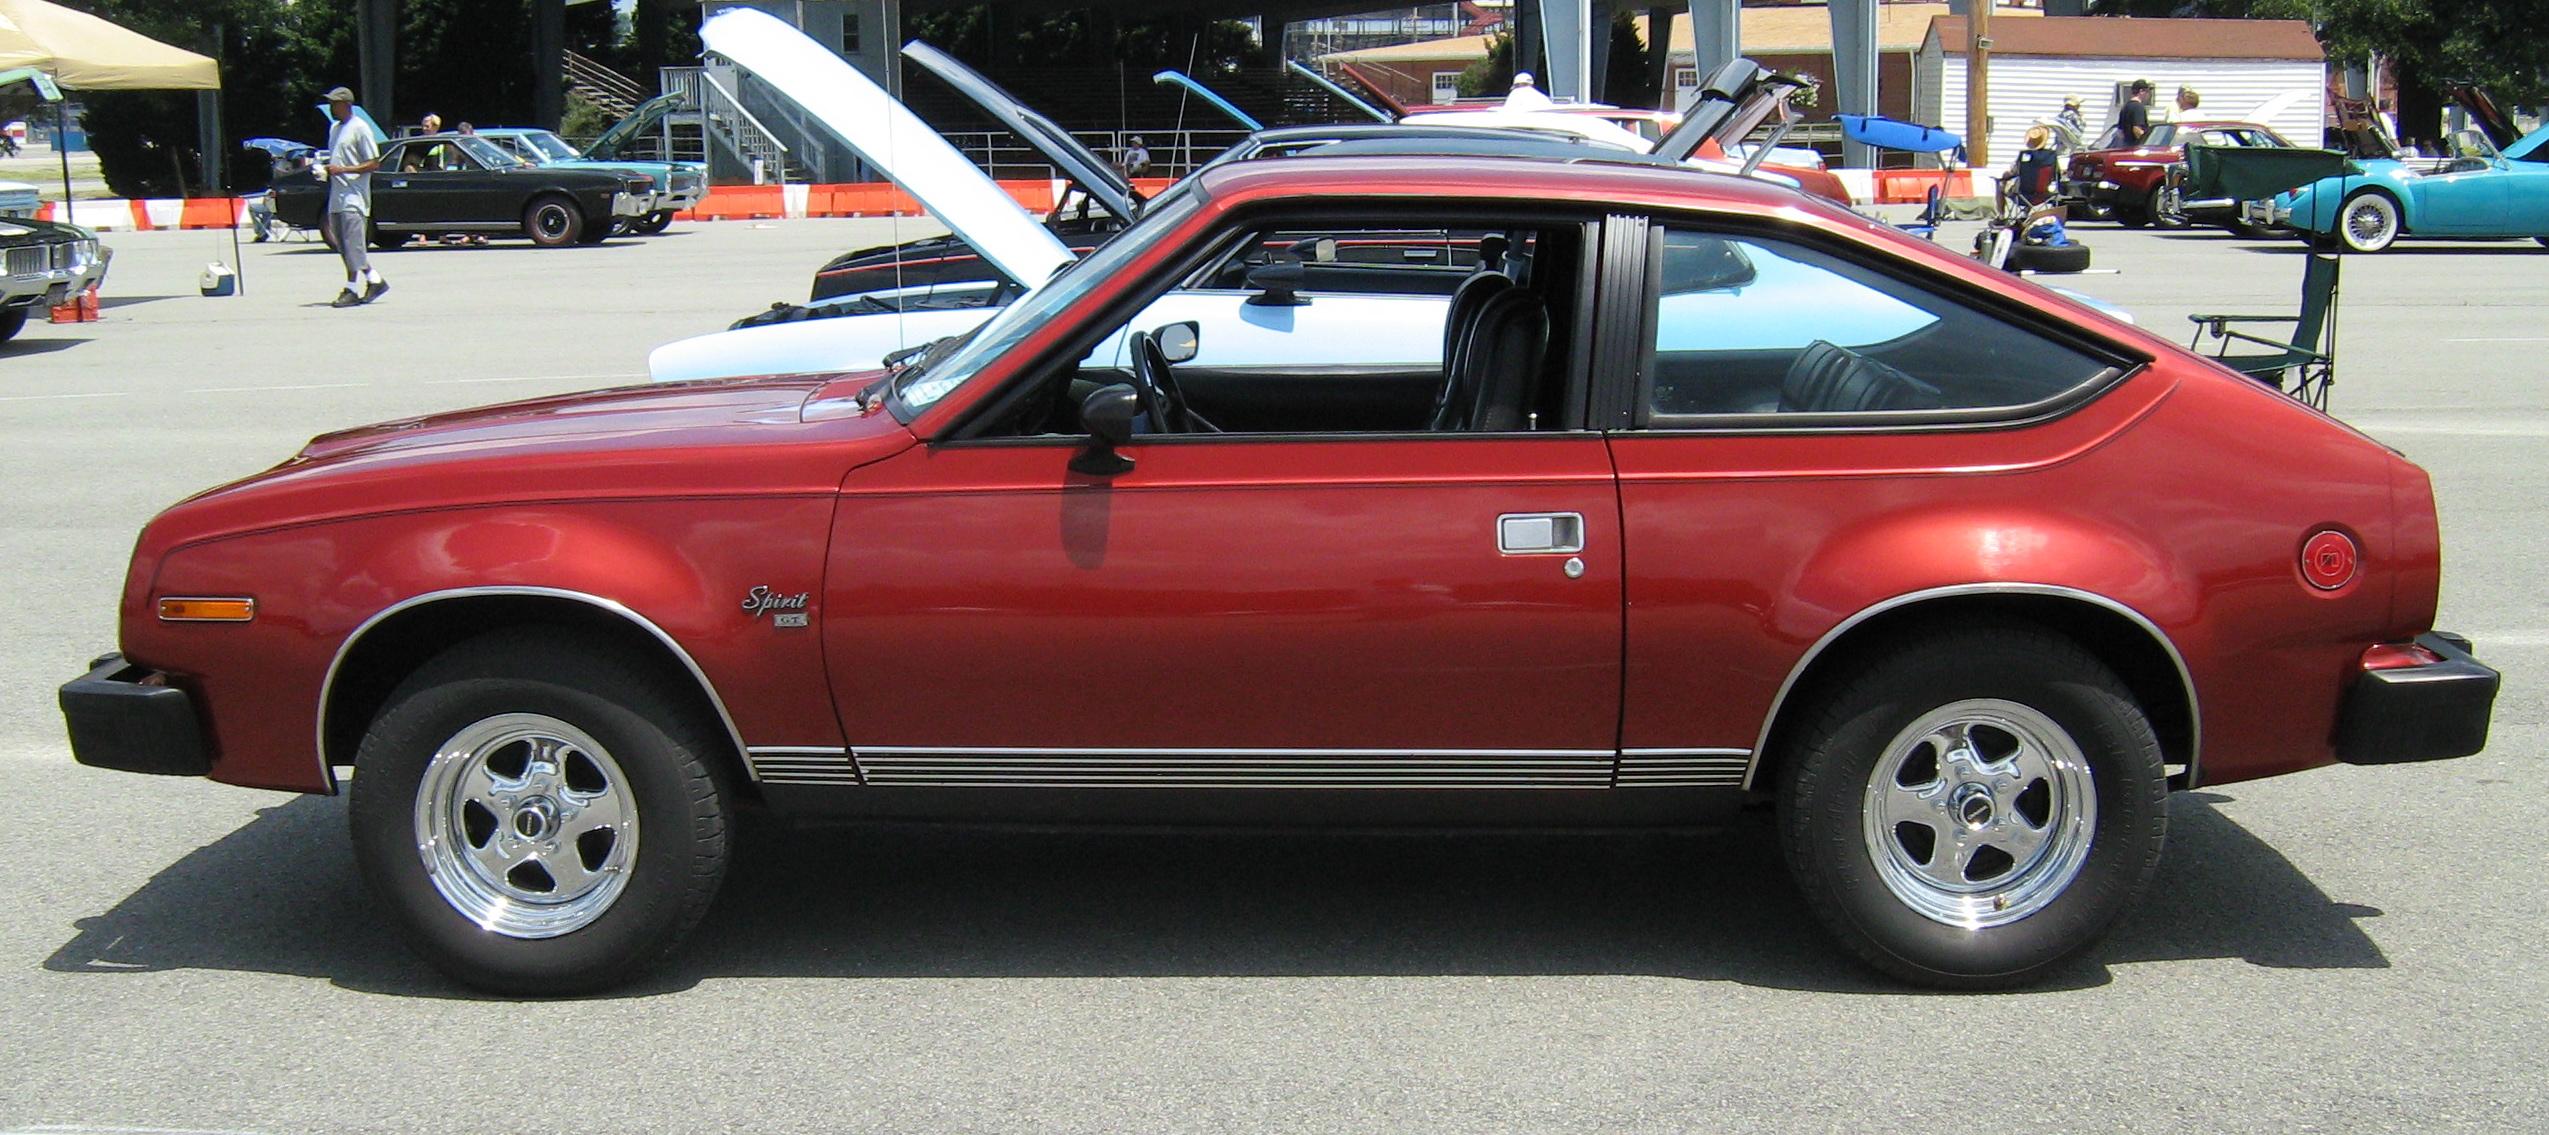 1979 Amc Spirit Gt V8 Russet Sl Jpg